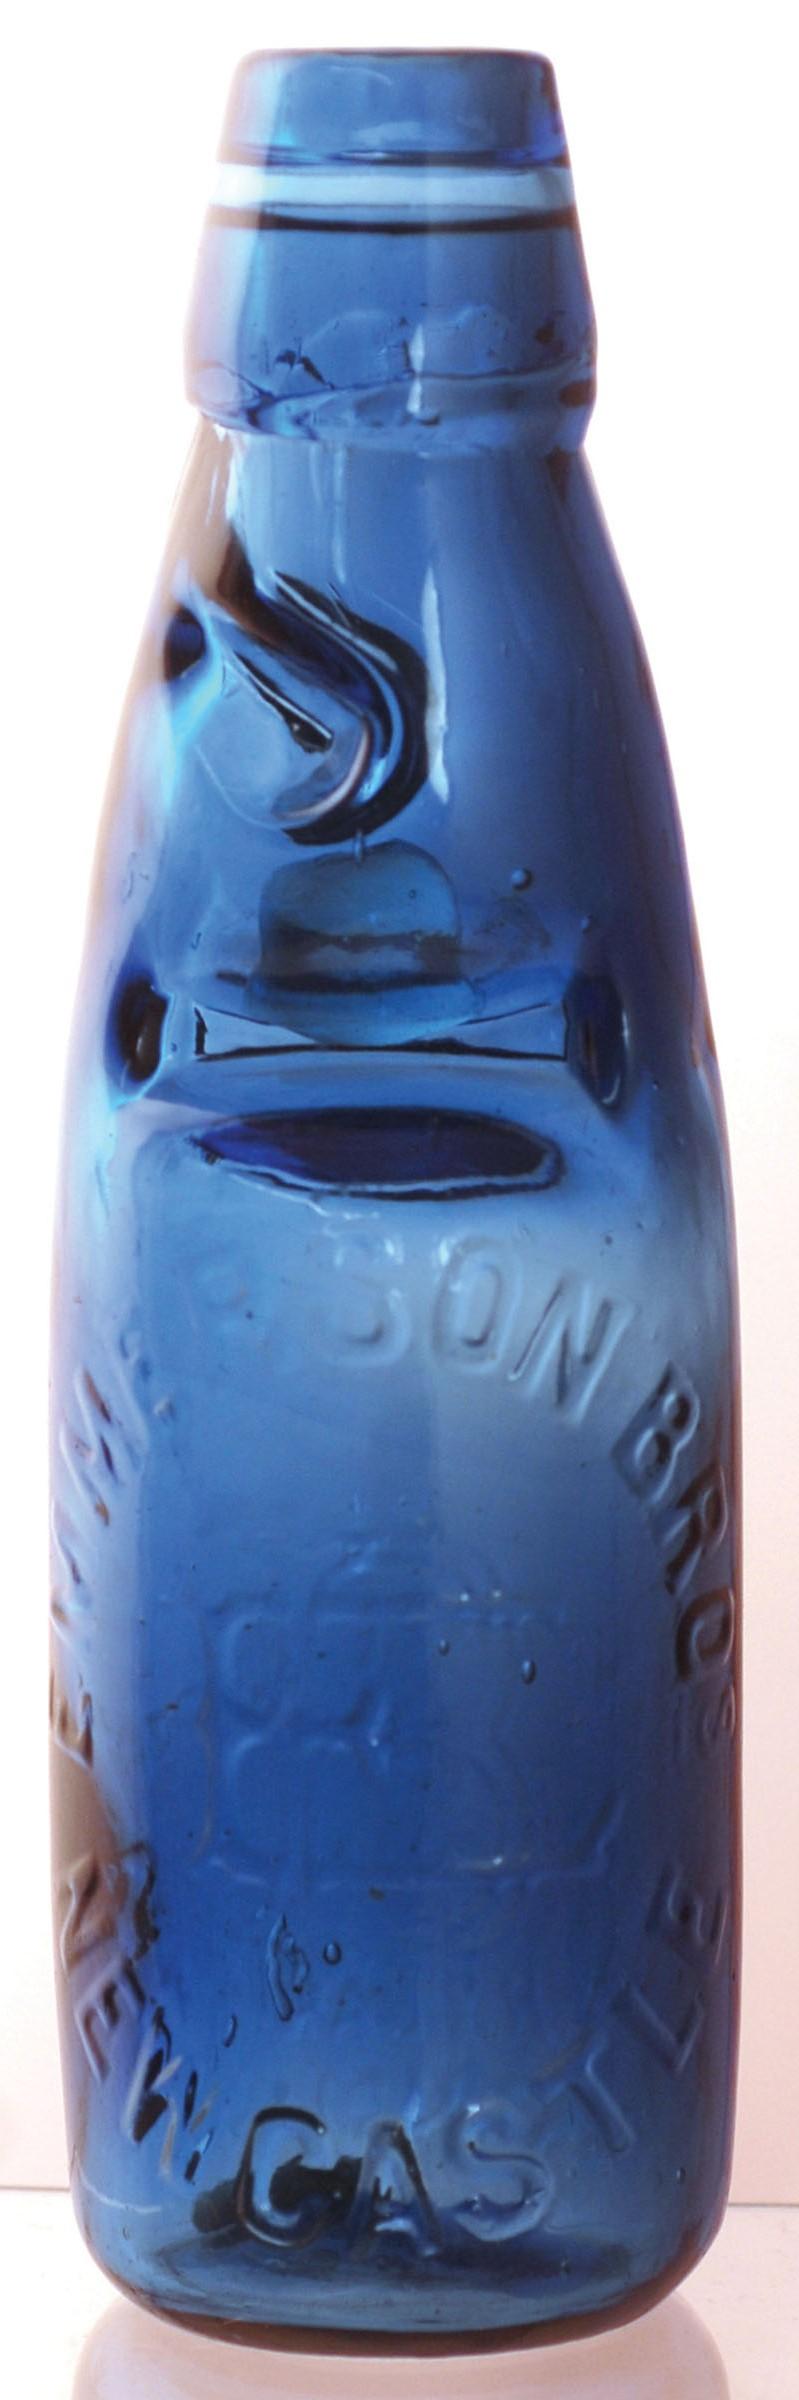 Antique Codd Bottles